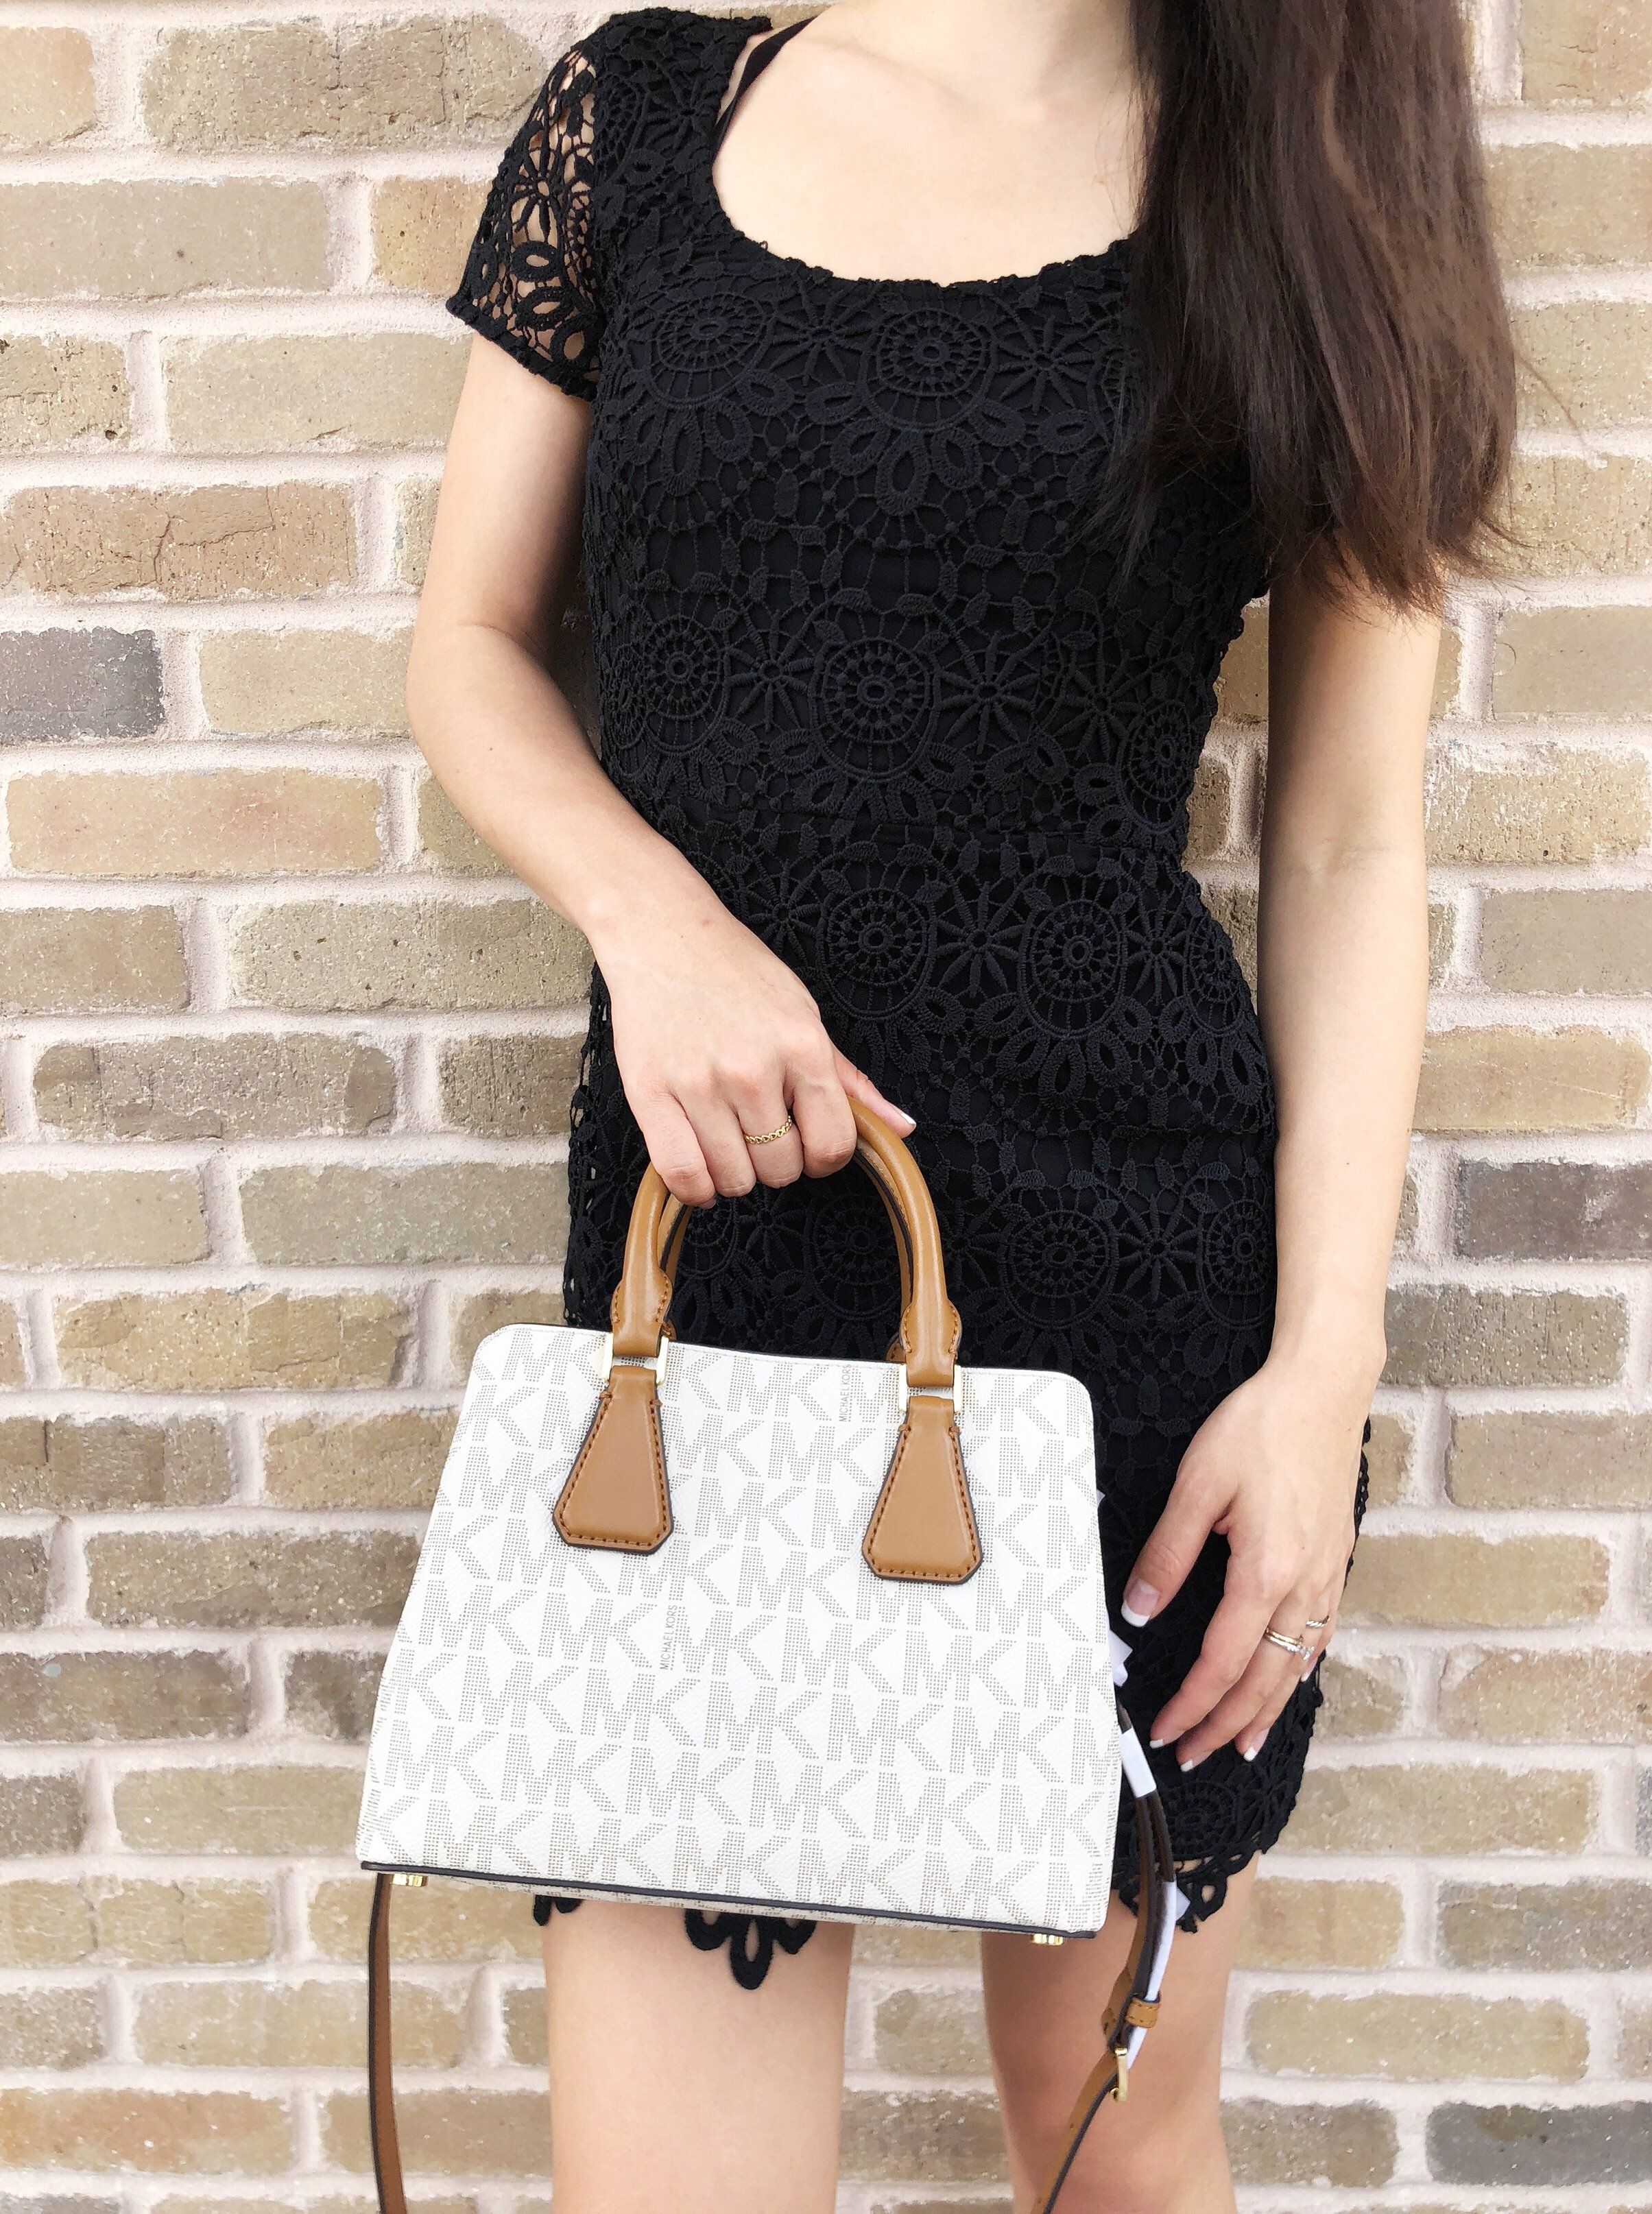 9a33a335e908 Michael Kors Camille Savannah Small Satchel Vanilla MK Acorn Mini Crossbody  #MK #MichaelKors #Handbags